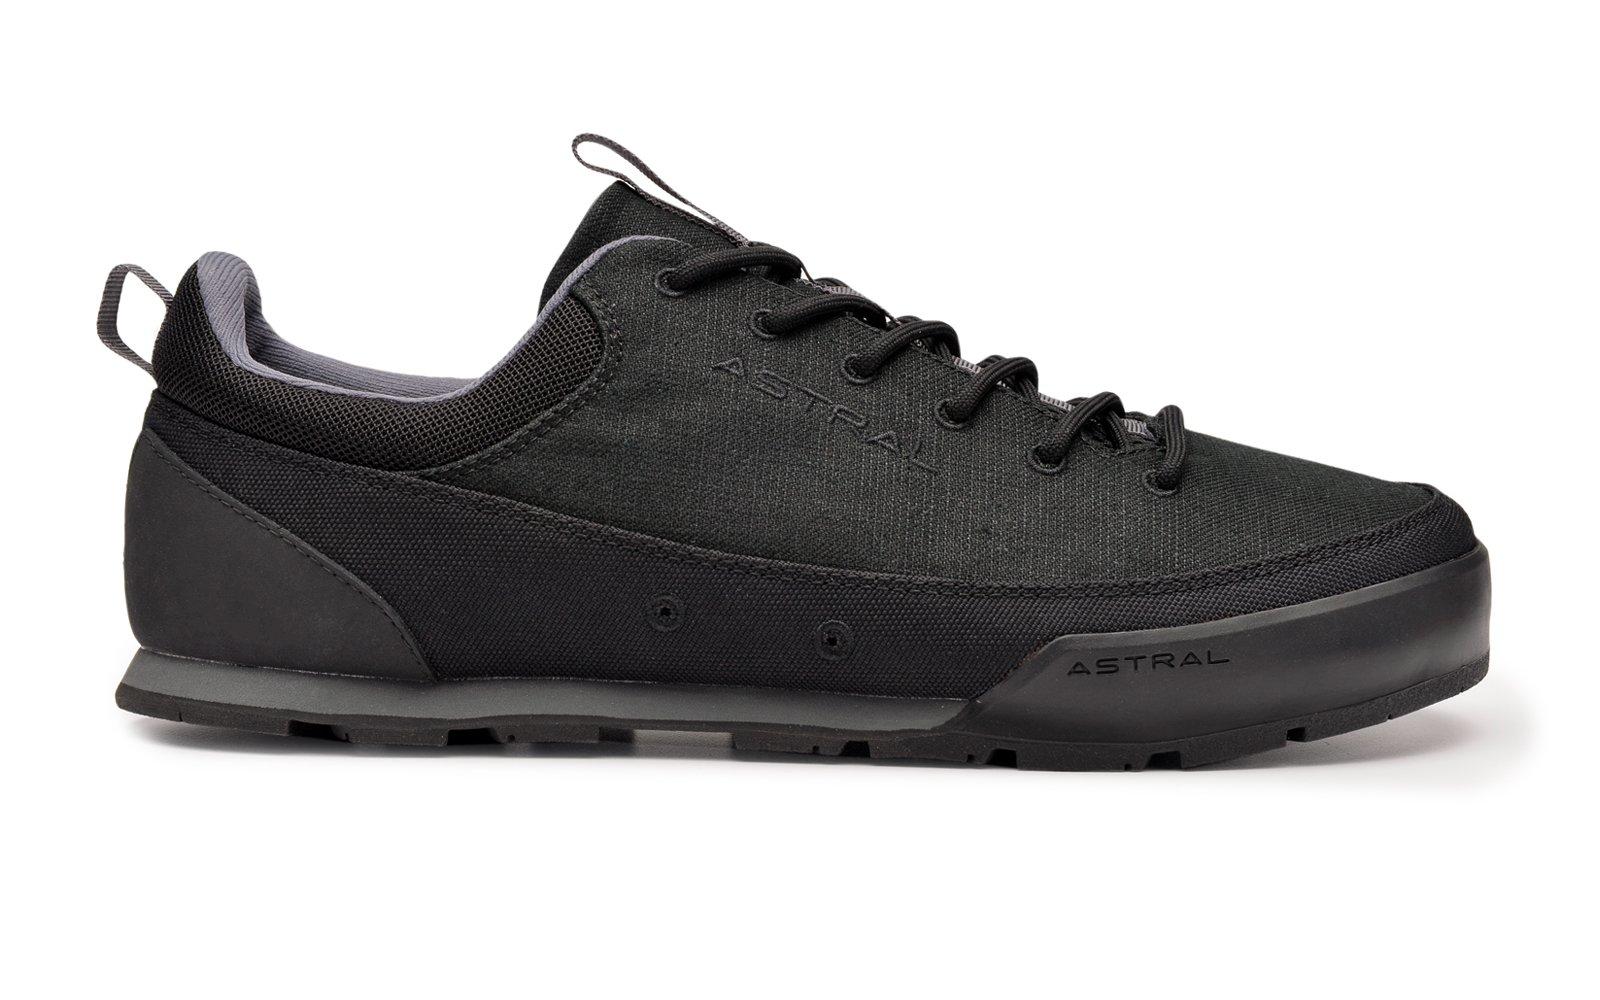 Astral Men's Rambler Shoe